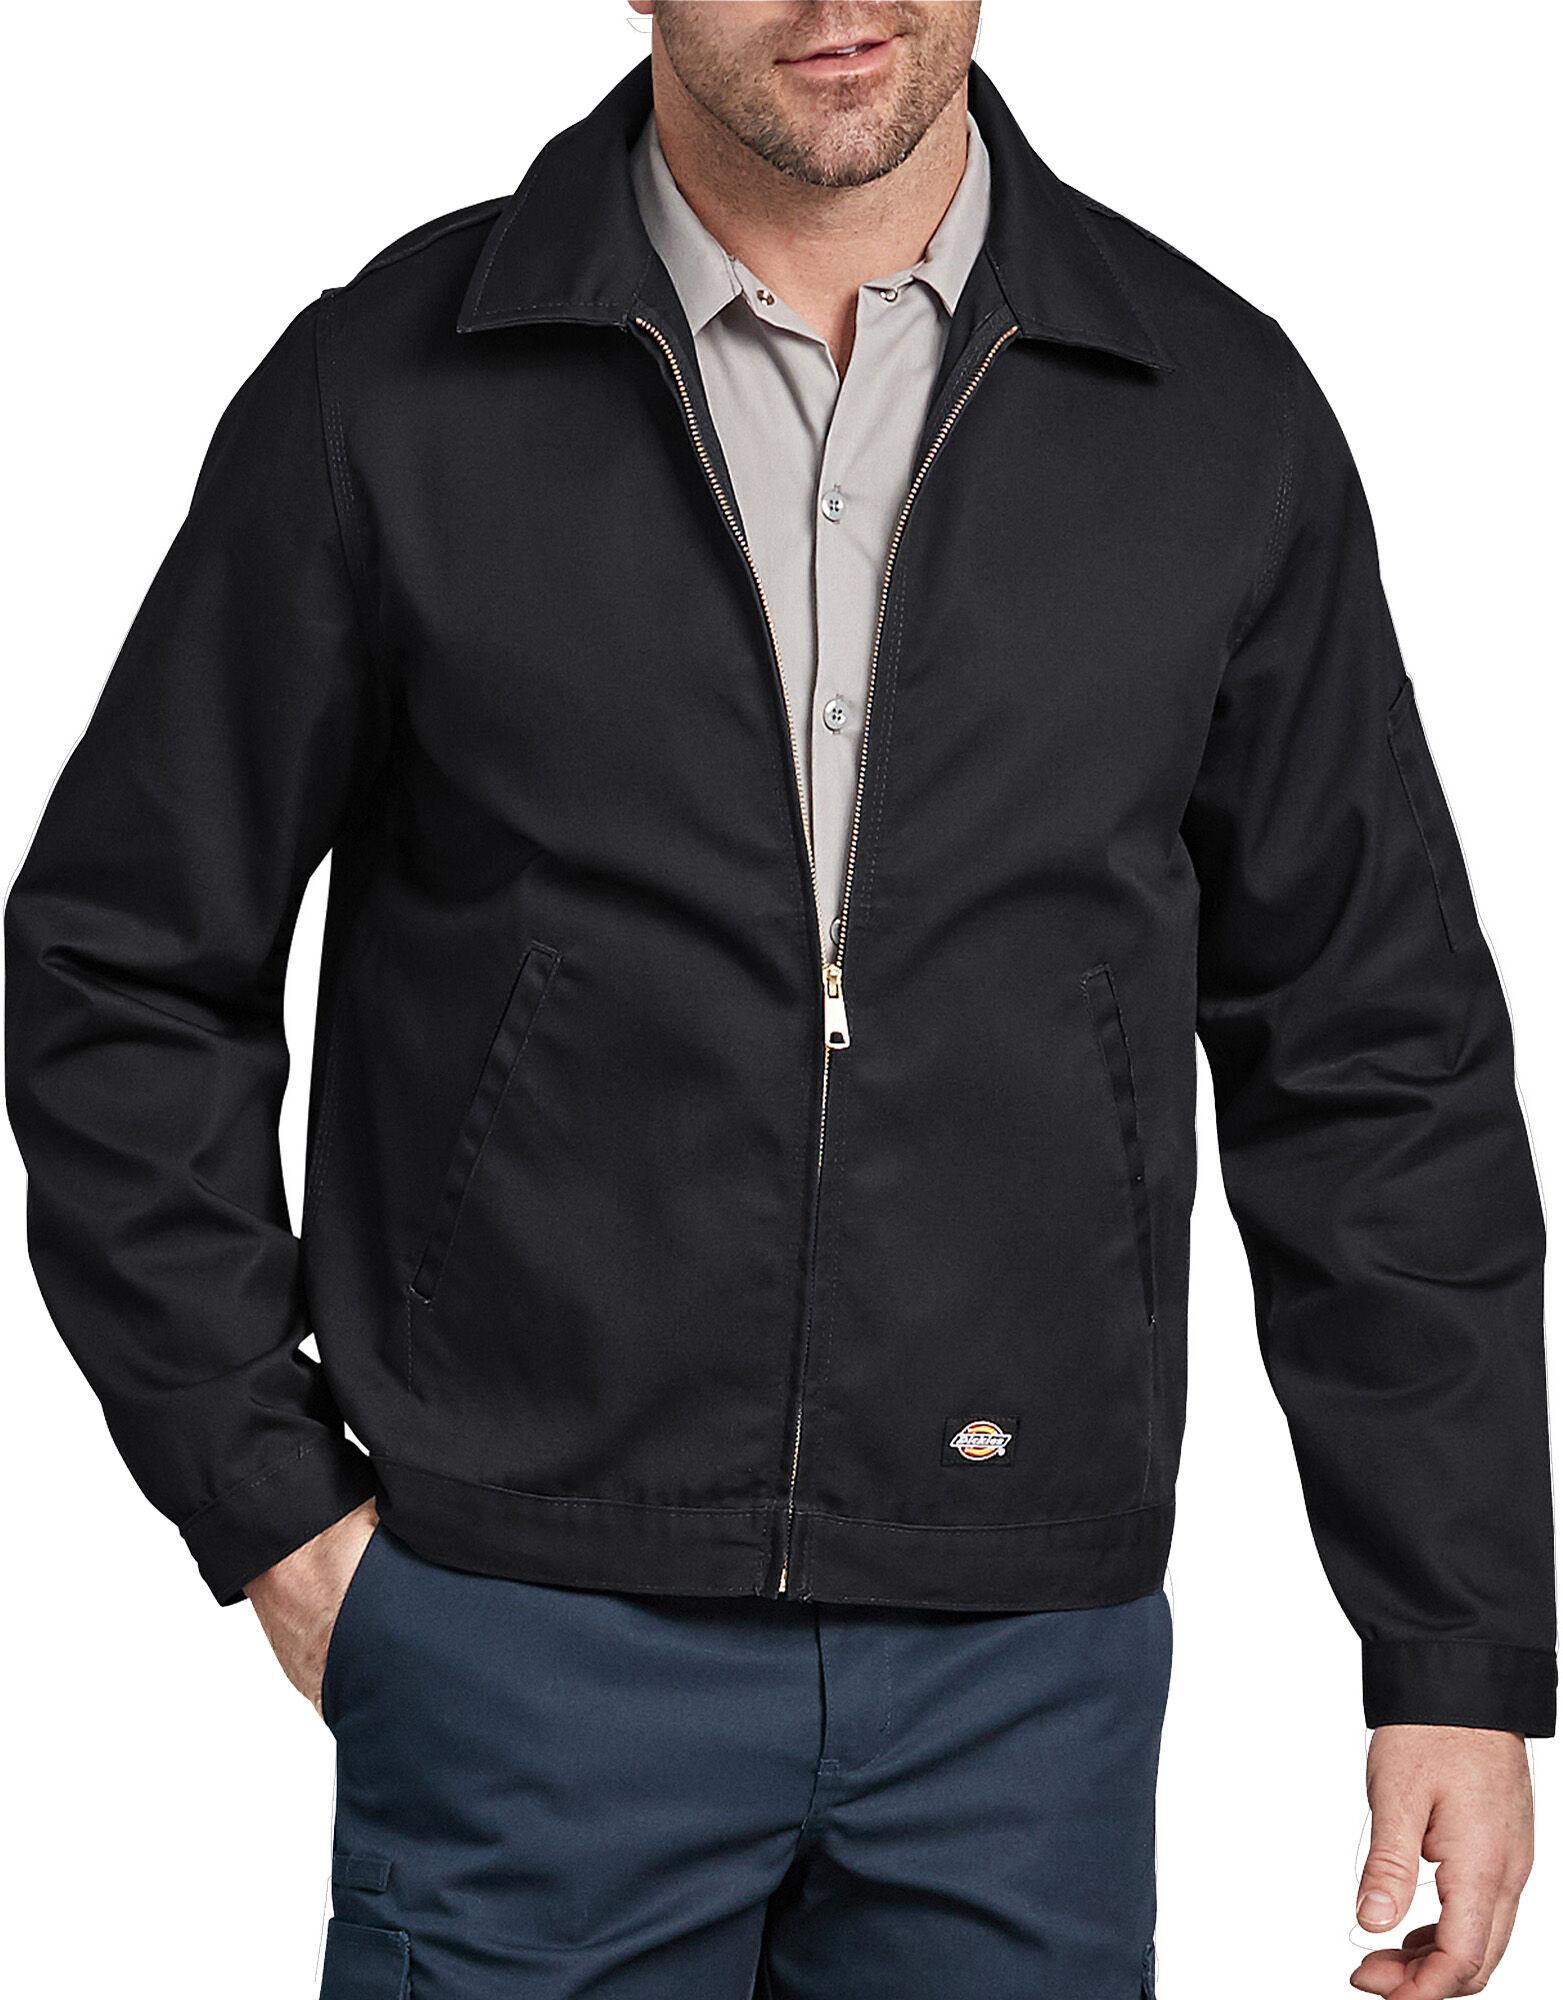 Unlined Eisenhower Jacket For Men | Dickies